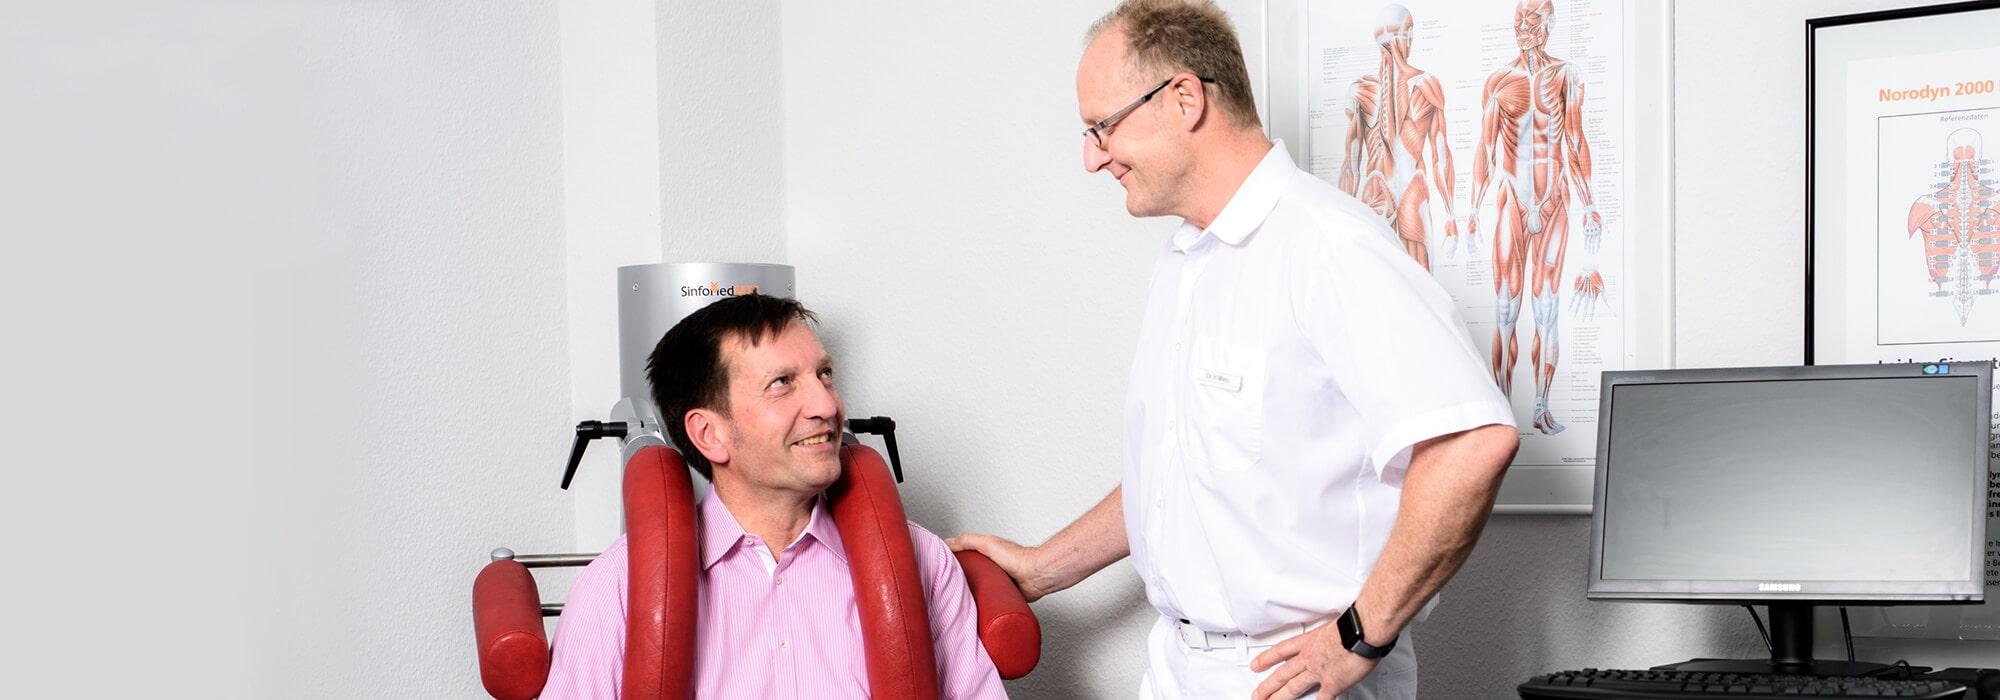 Orthopädie Bonn - Klippert, Mies, Sippel - Muskelfunktionsdiagnostik